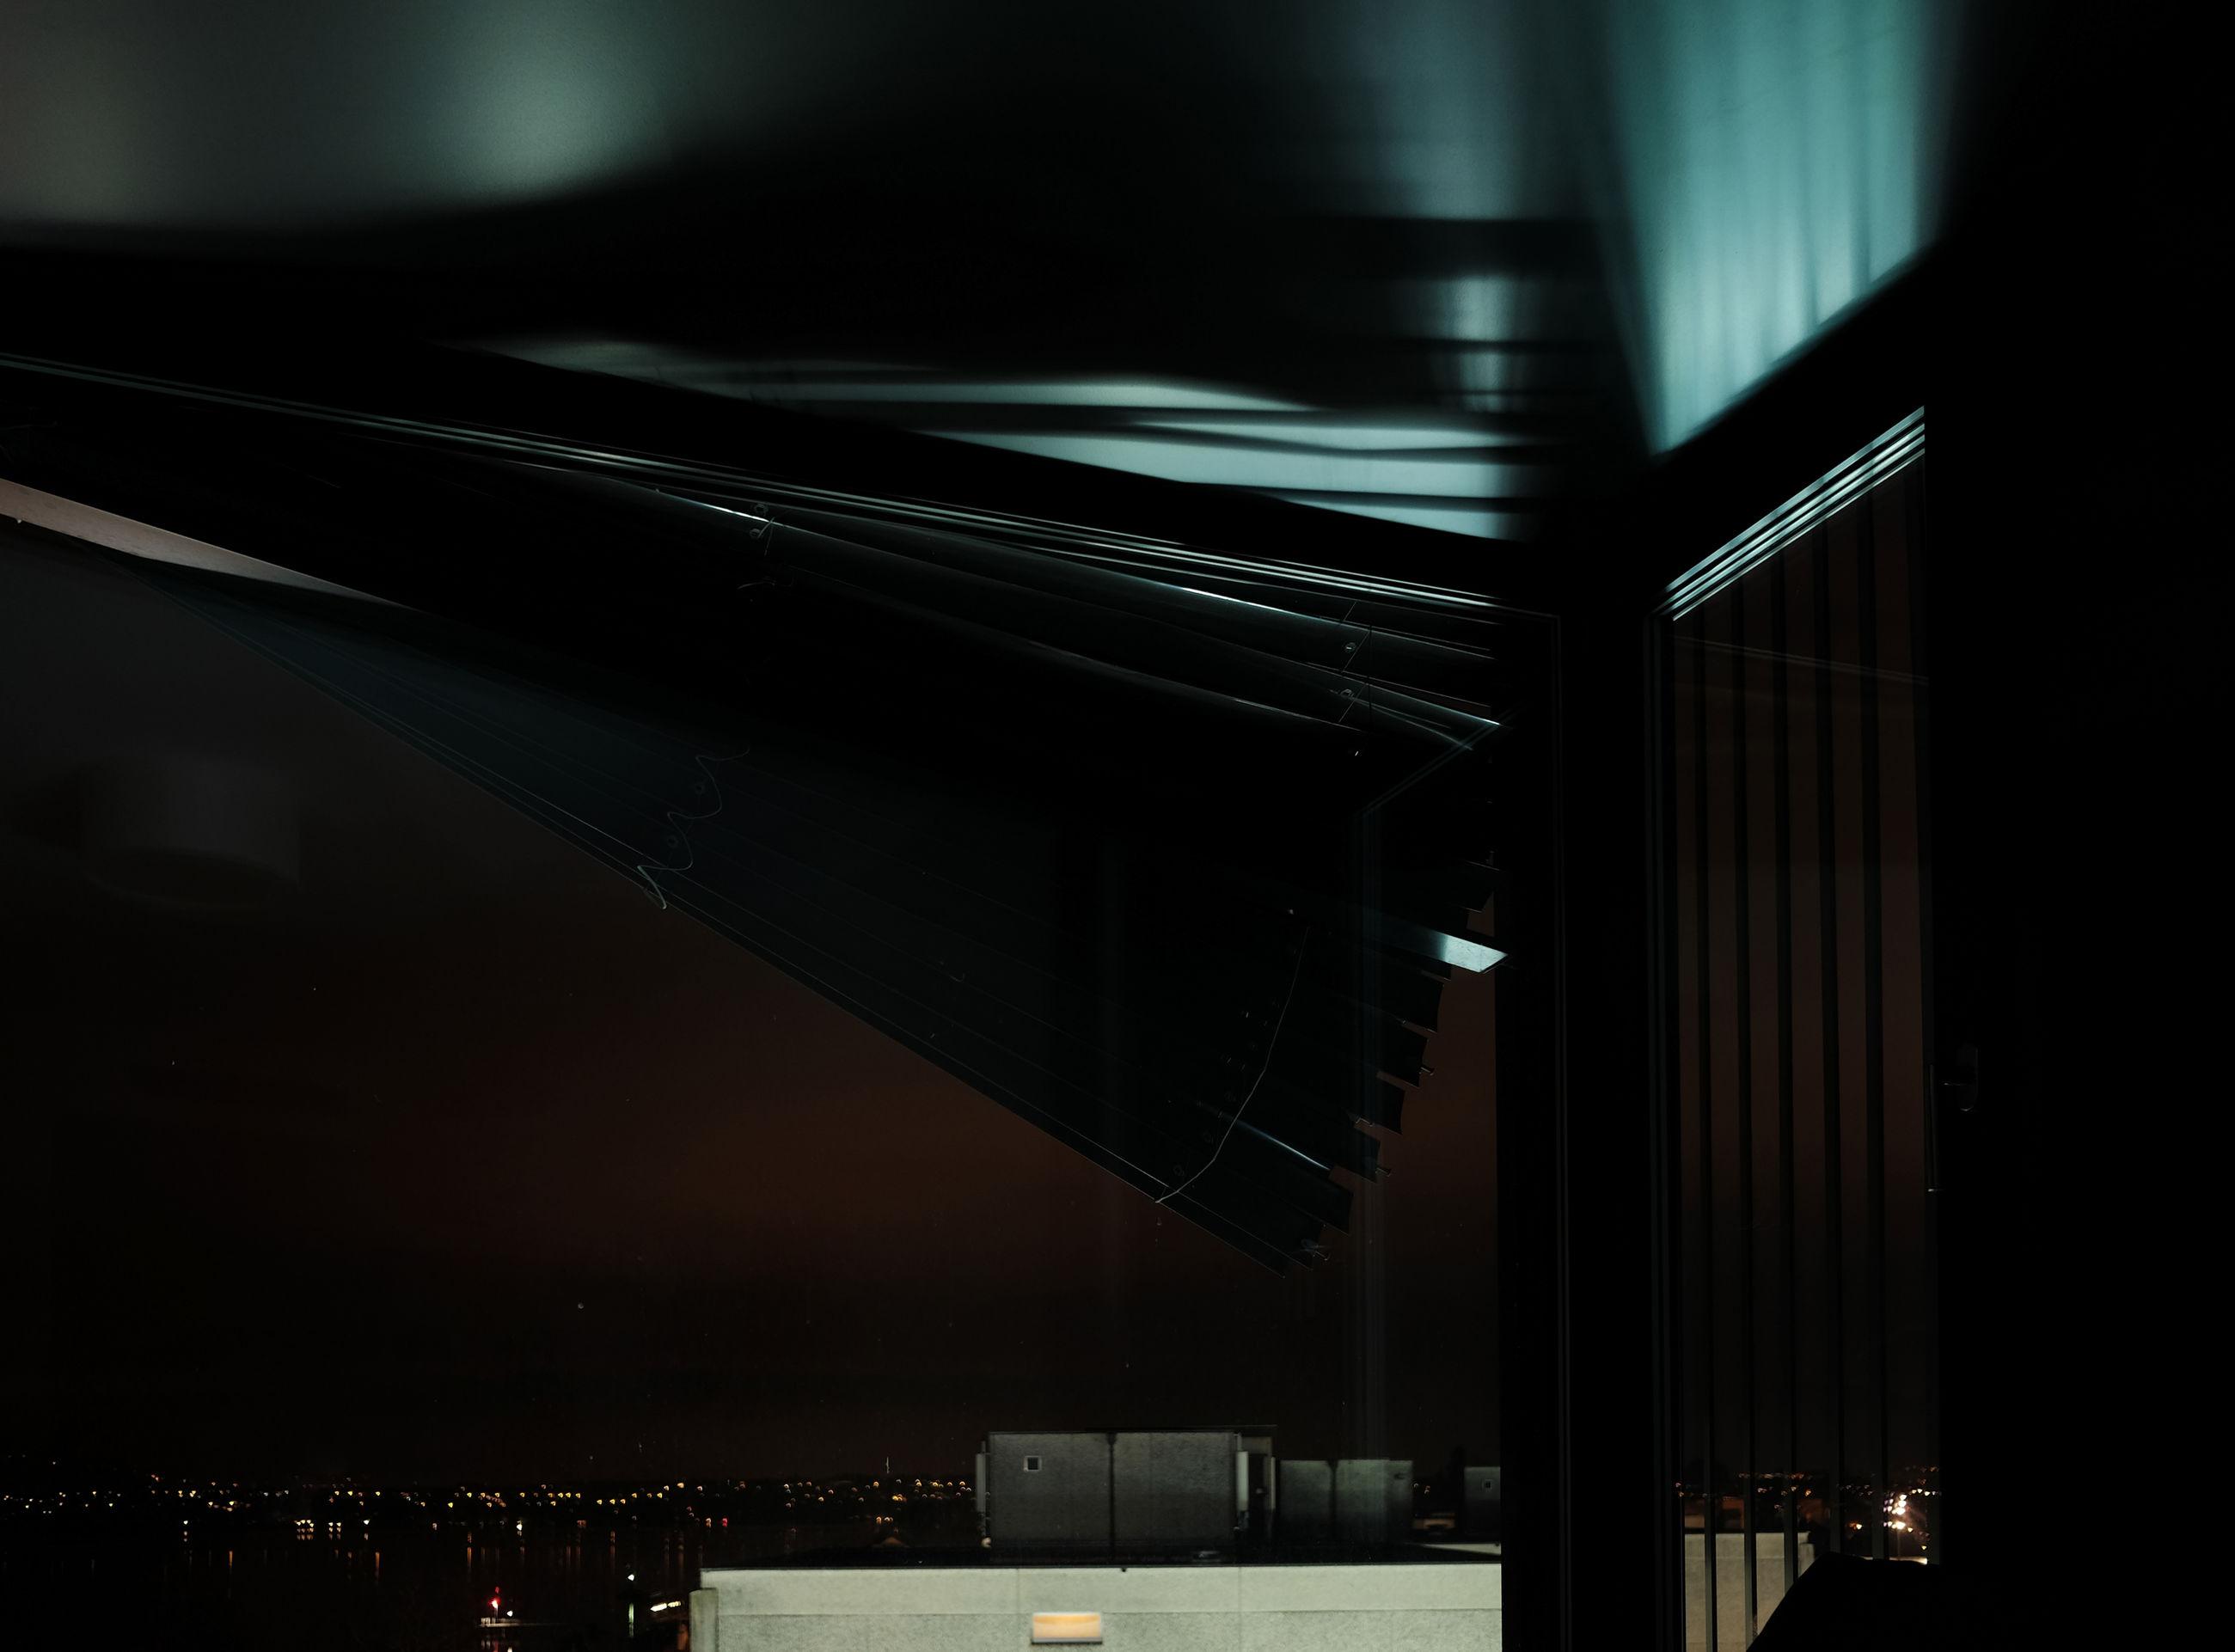 indoors, no people, night, illuminated